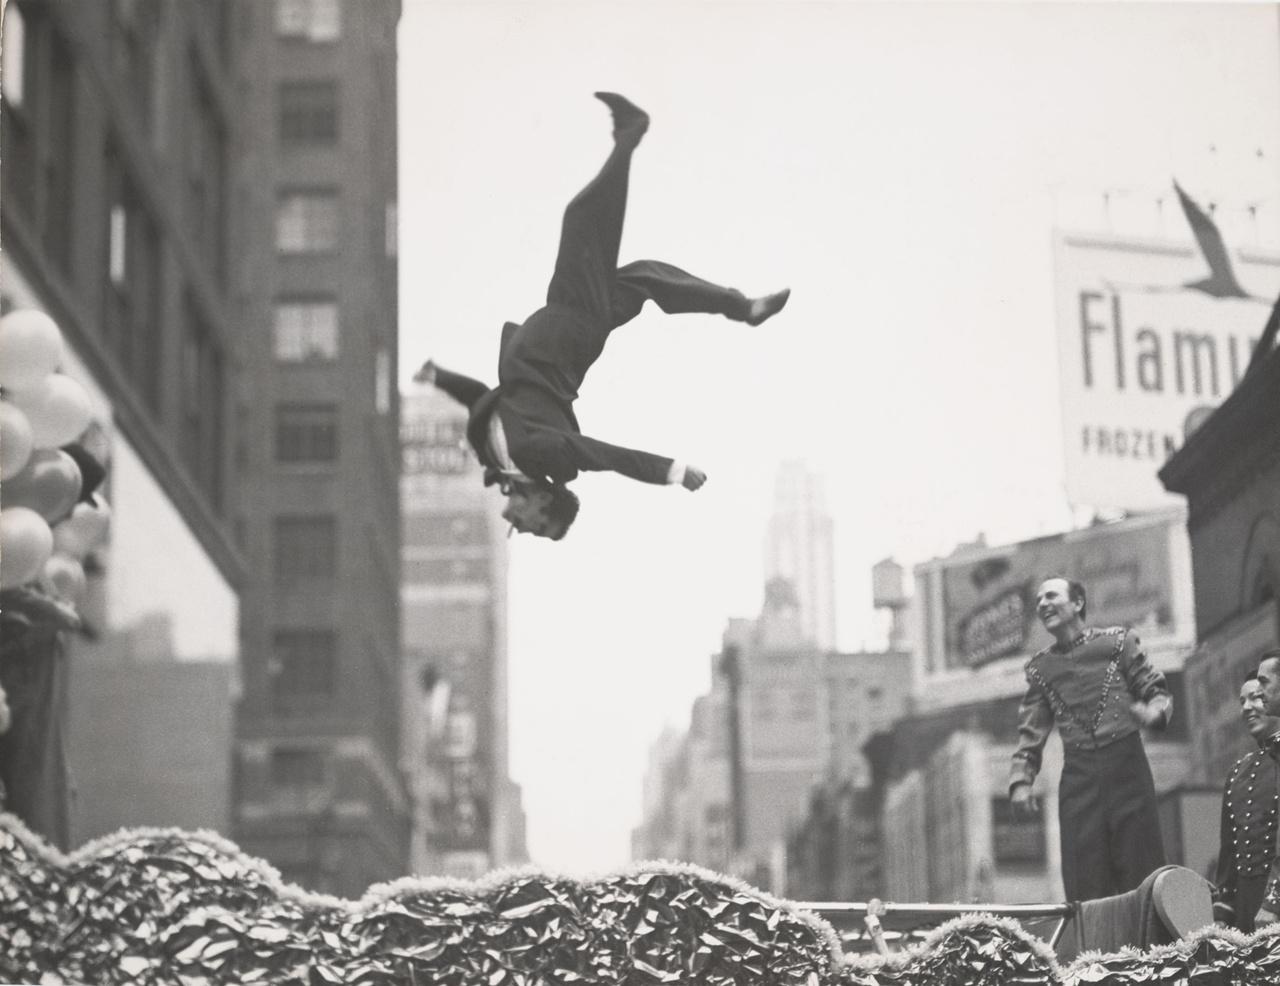 New York (1985)